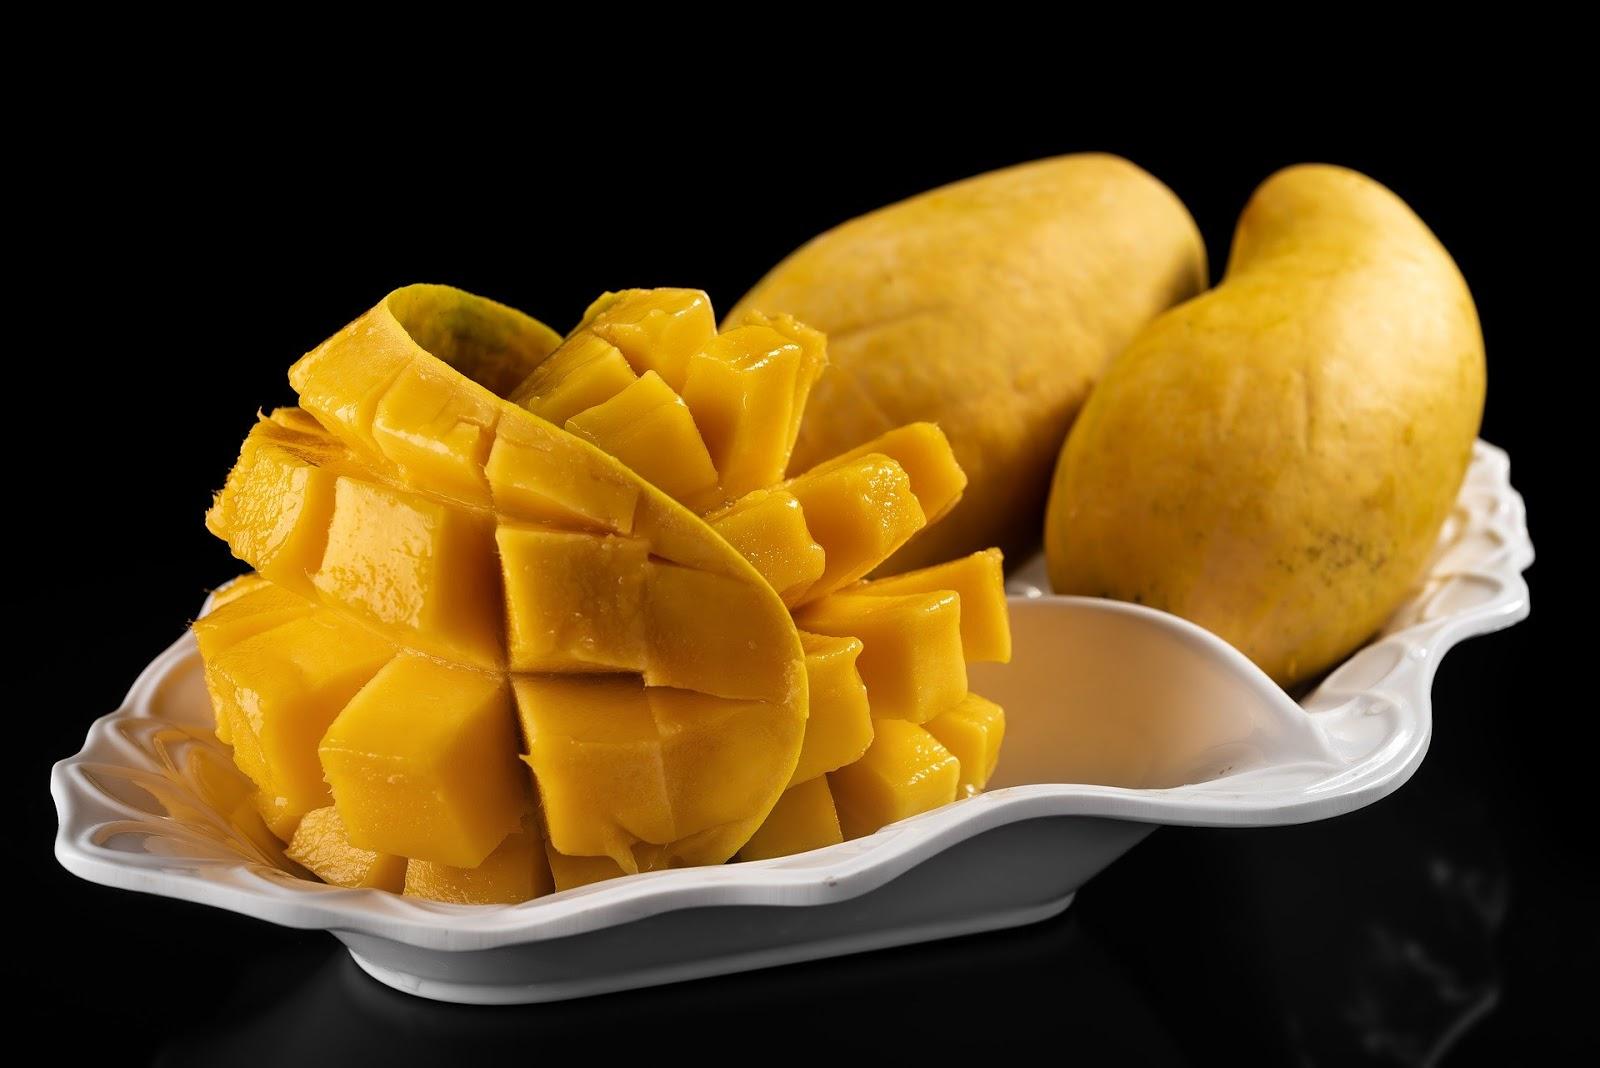 Fresh sliced creative Mango on plate